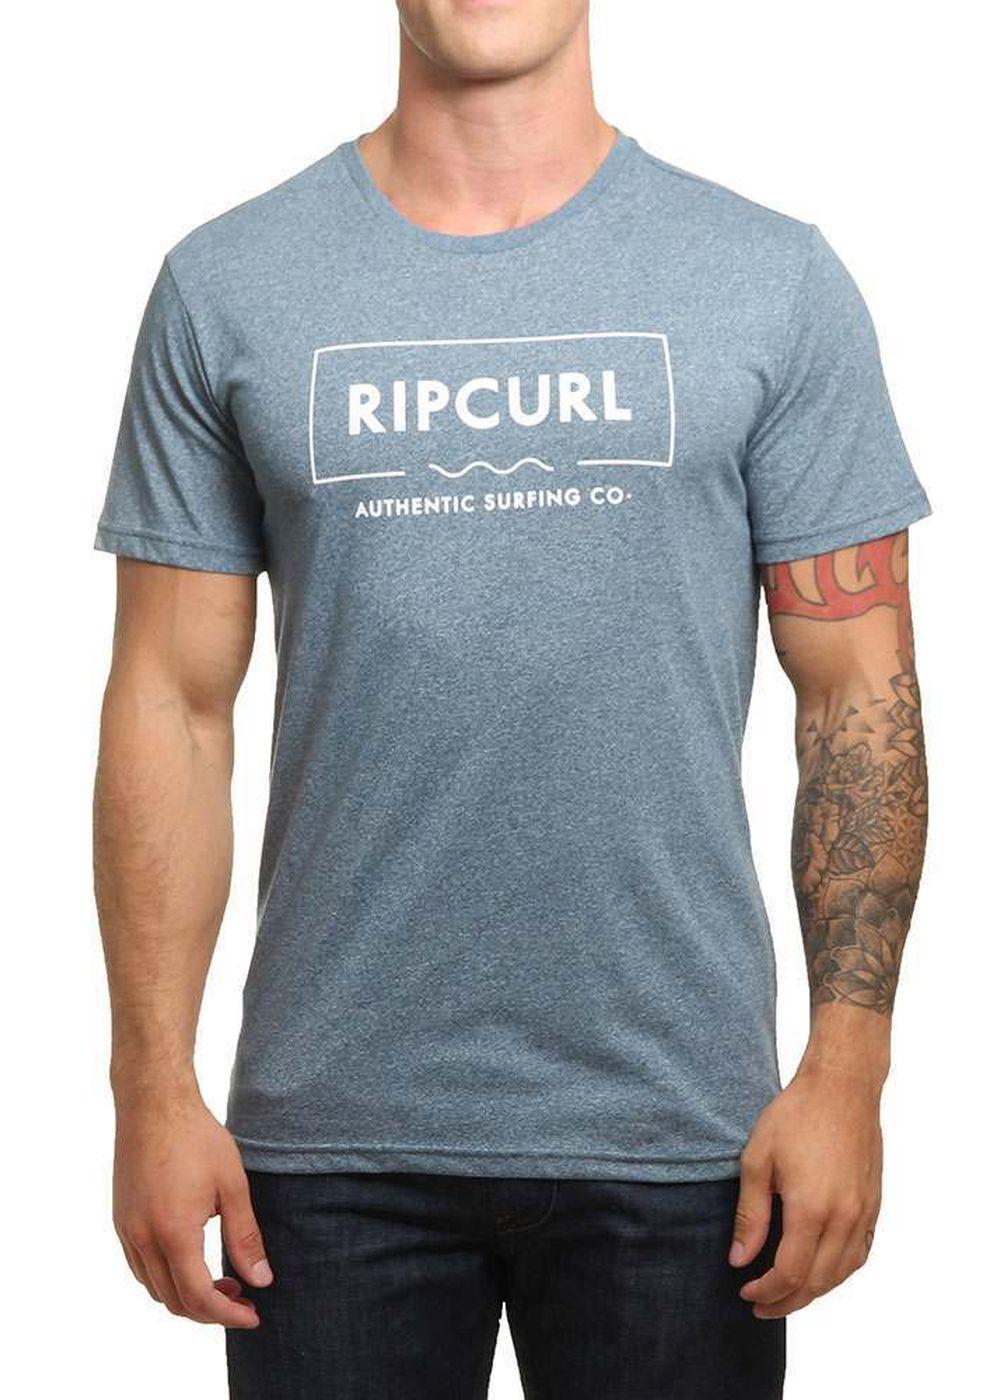 ripcurl-broken-angle-tee-indian-teal